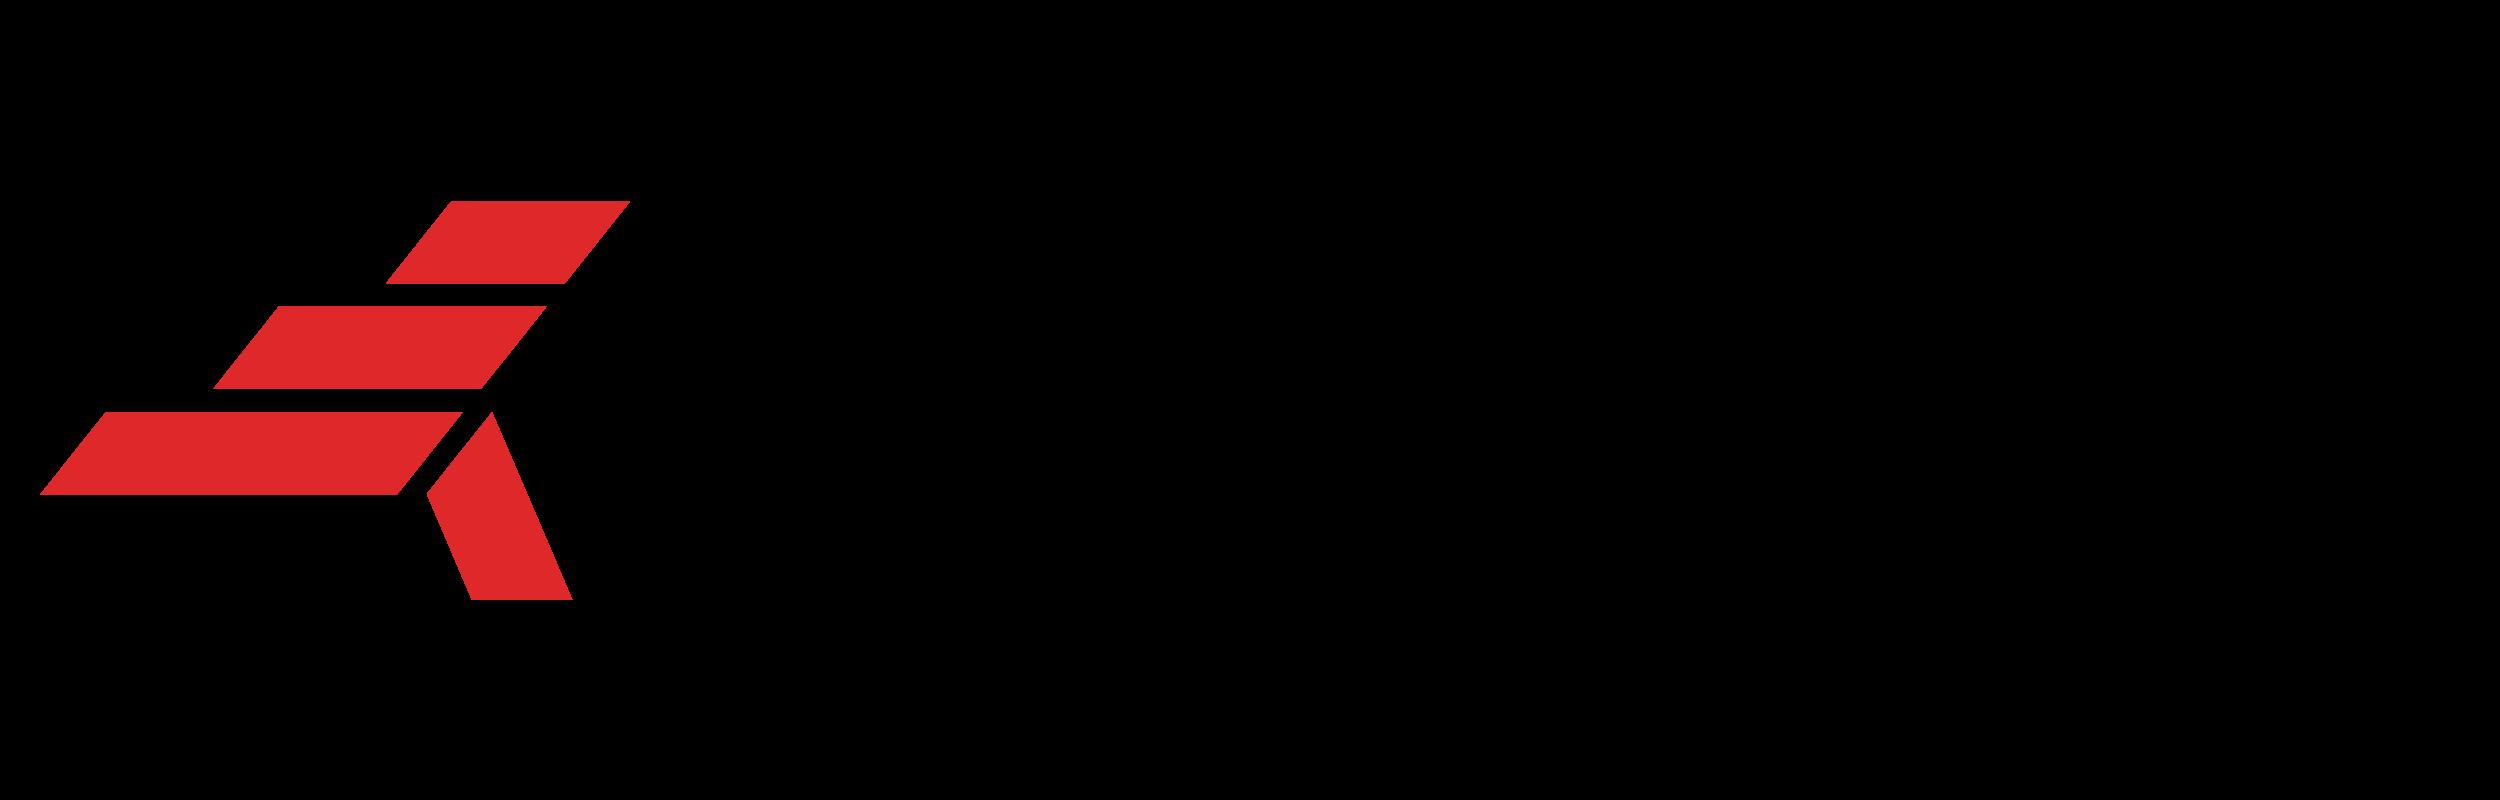 Enerquímica